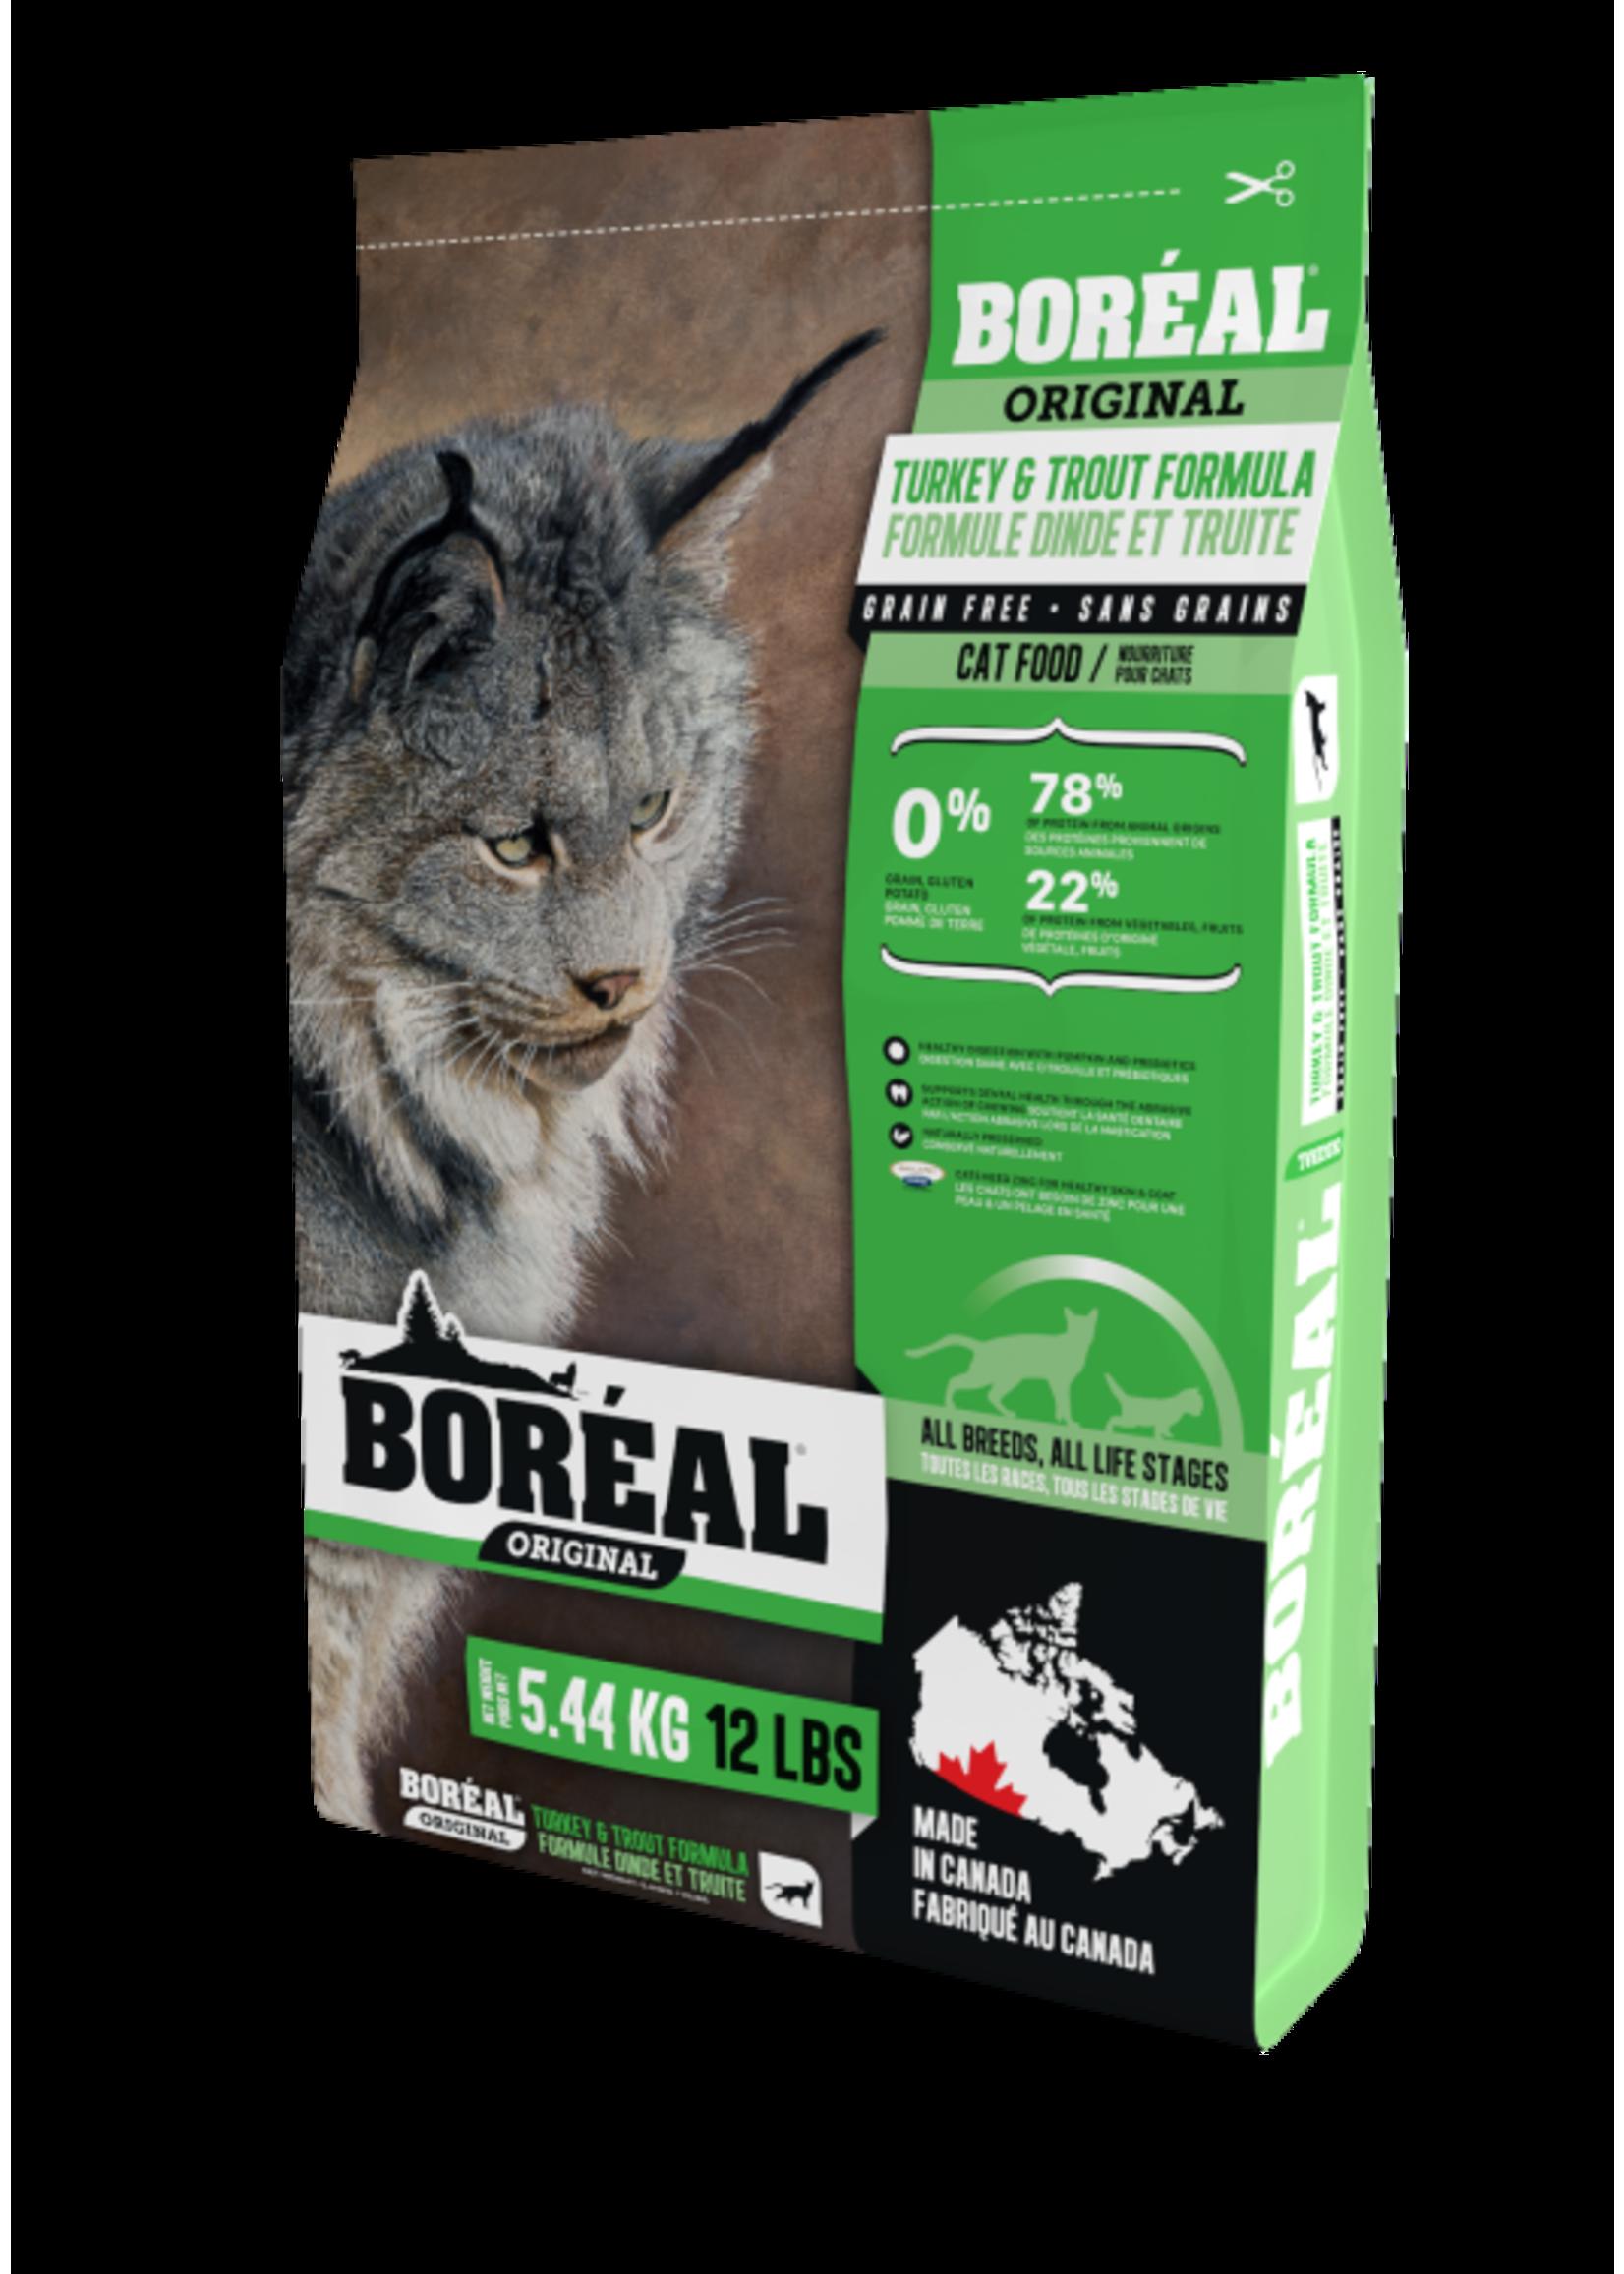 Boreal Original Cat Food Turkey & Trout 5.44kg